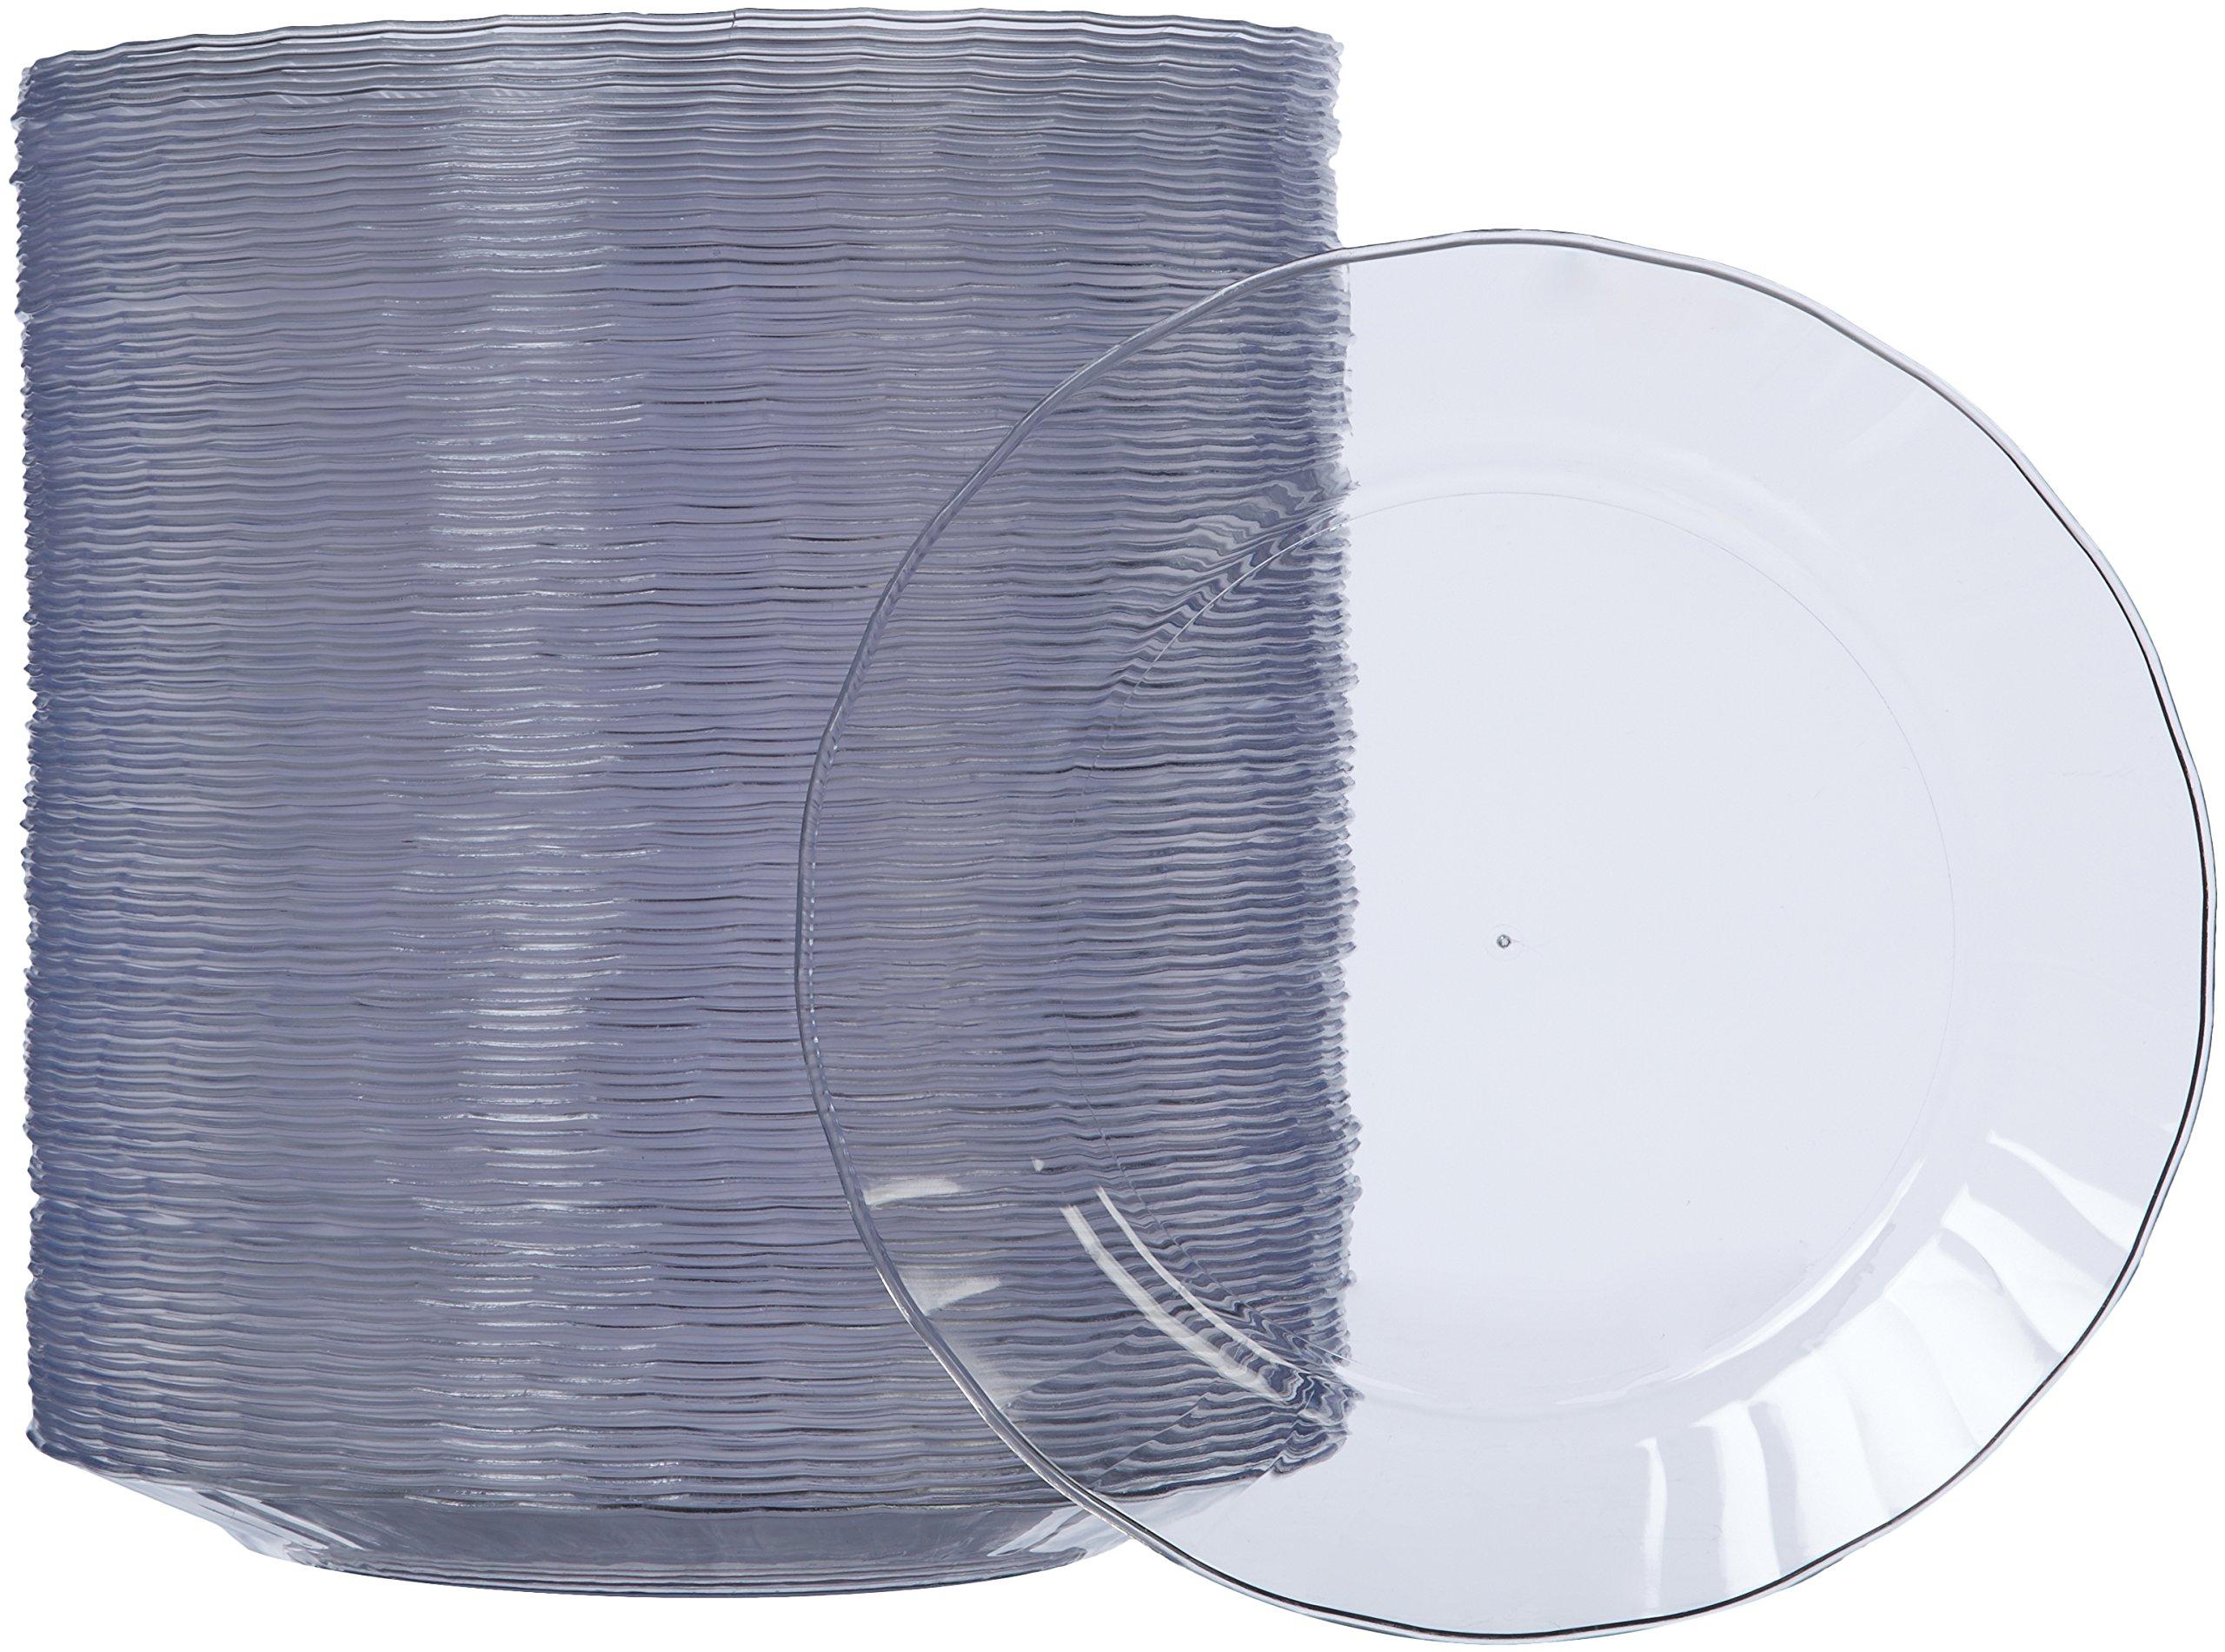 AmazonBasics Disposable Clear Plastic Plates, 100-Pack, 7.5-inch by AmazonBasics